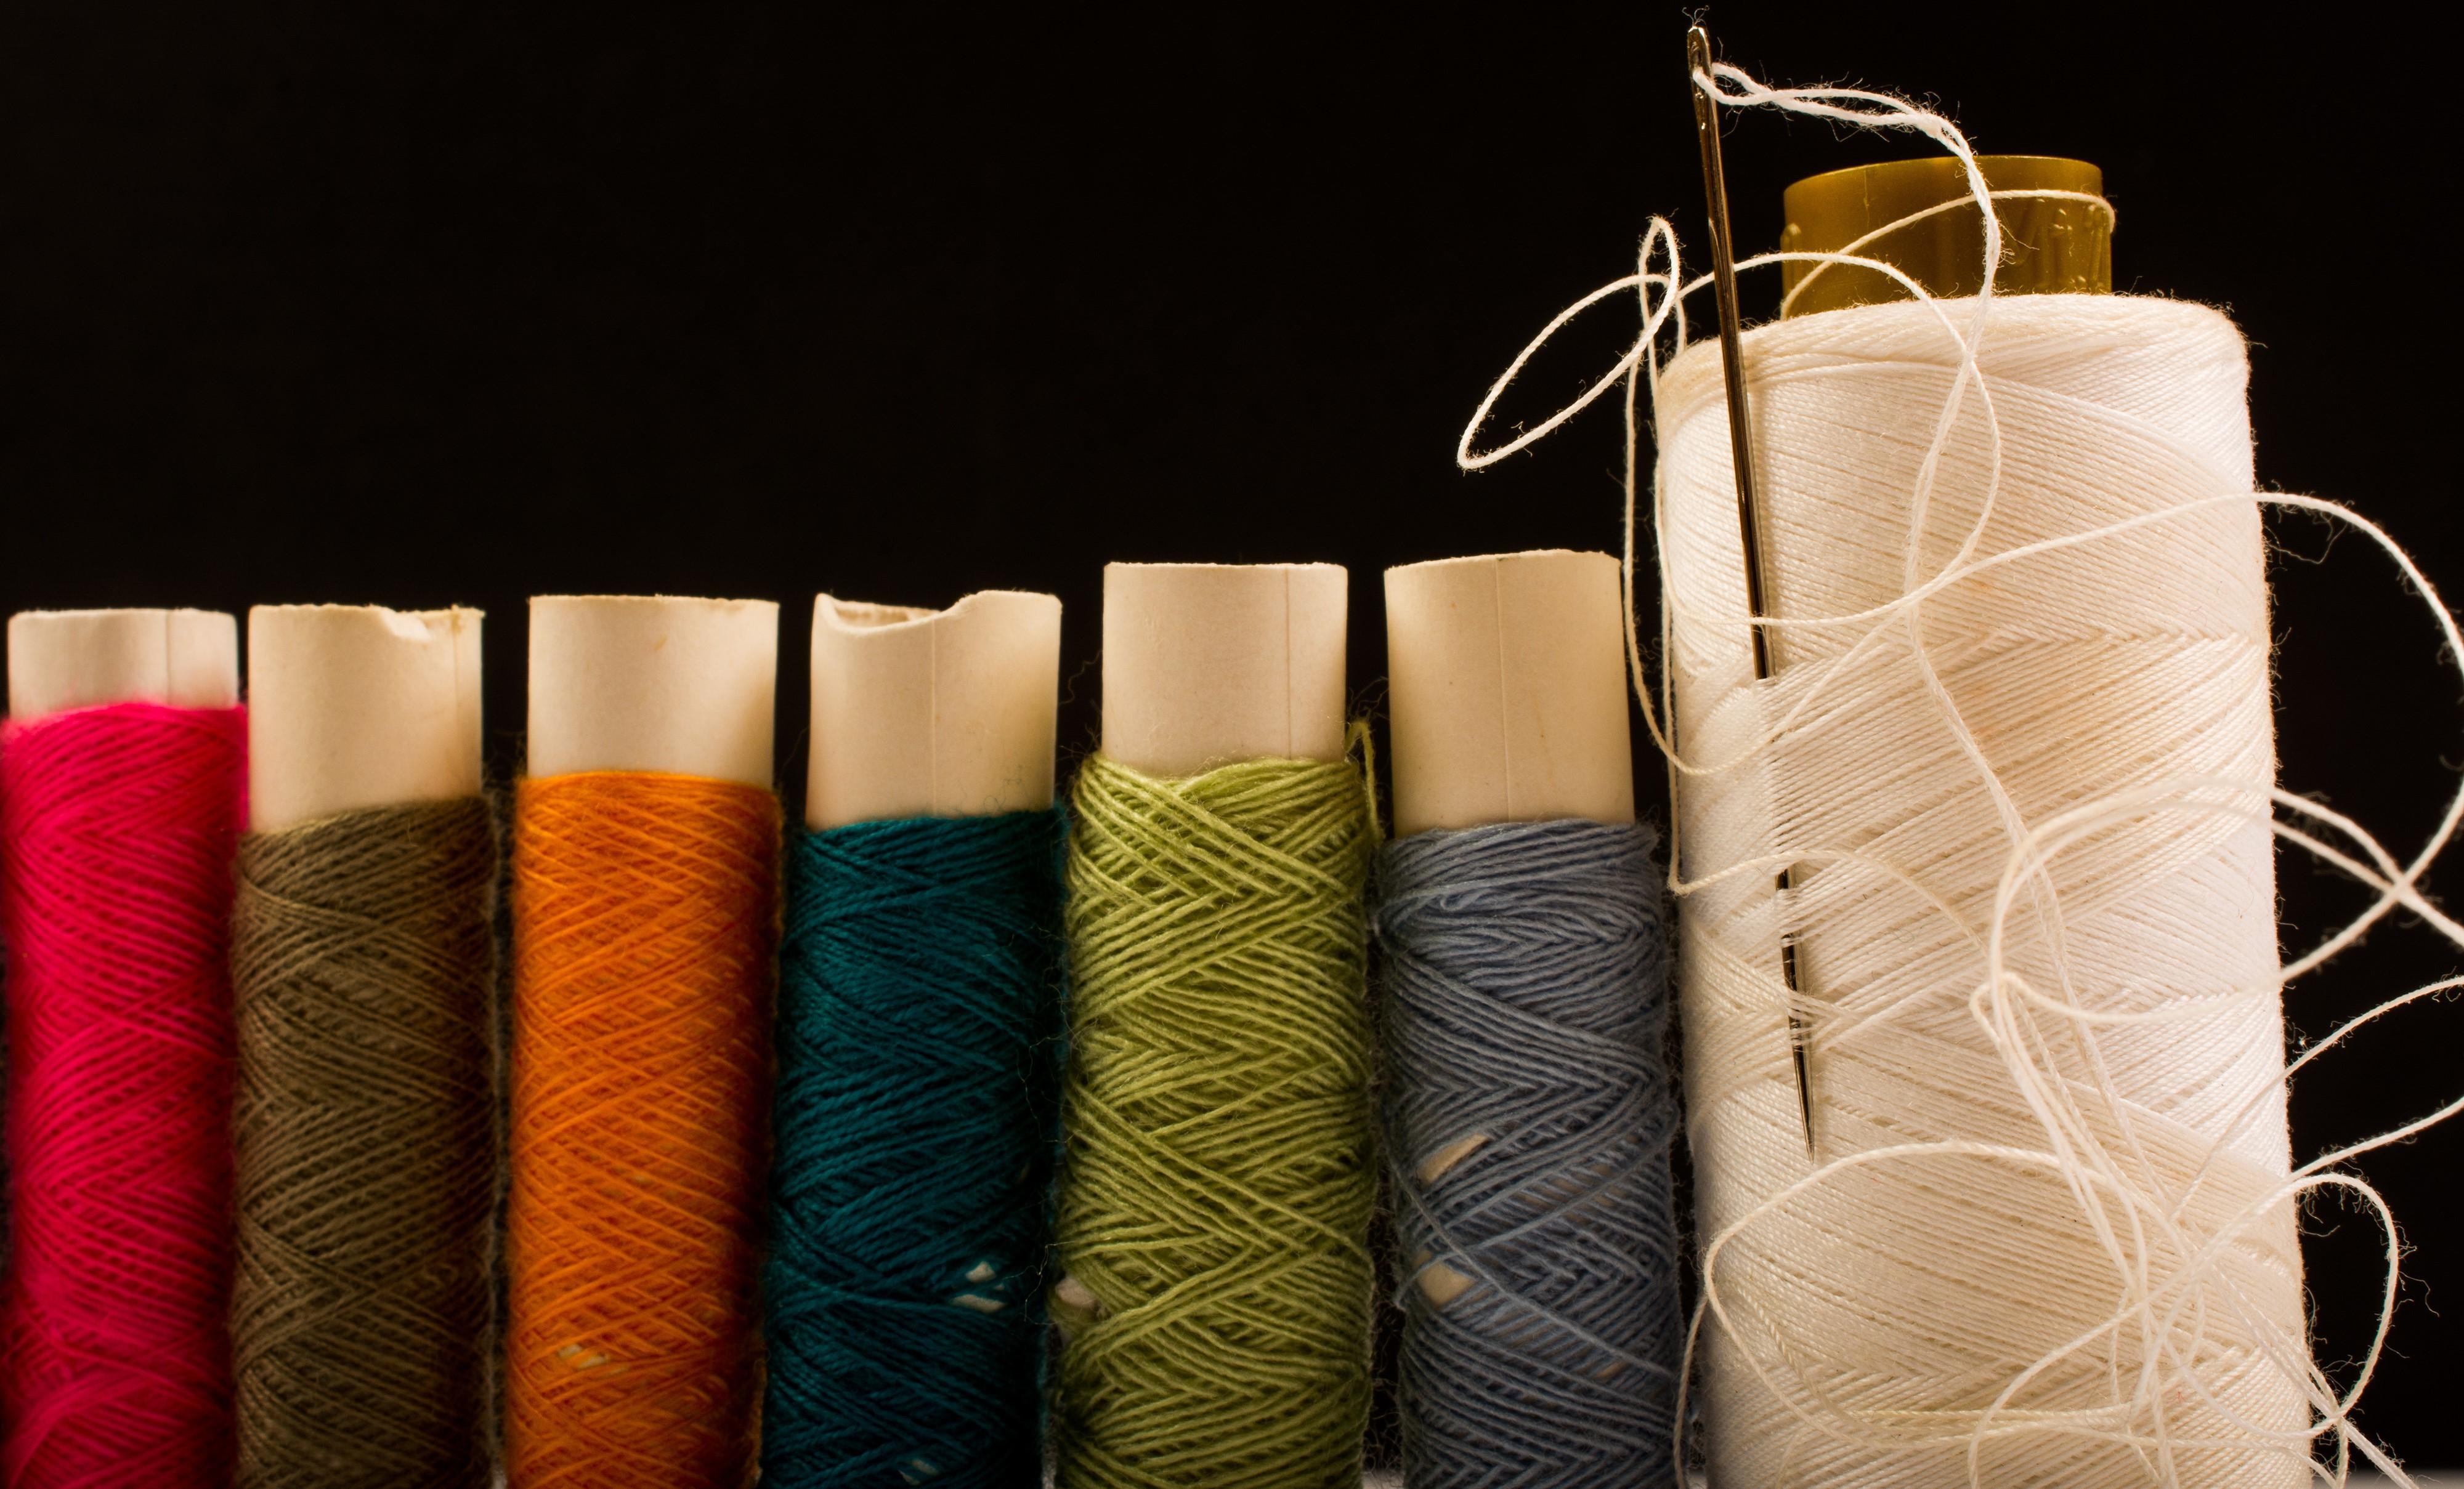 Aula kreativa de costura